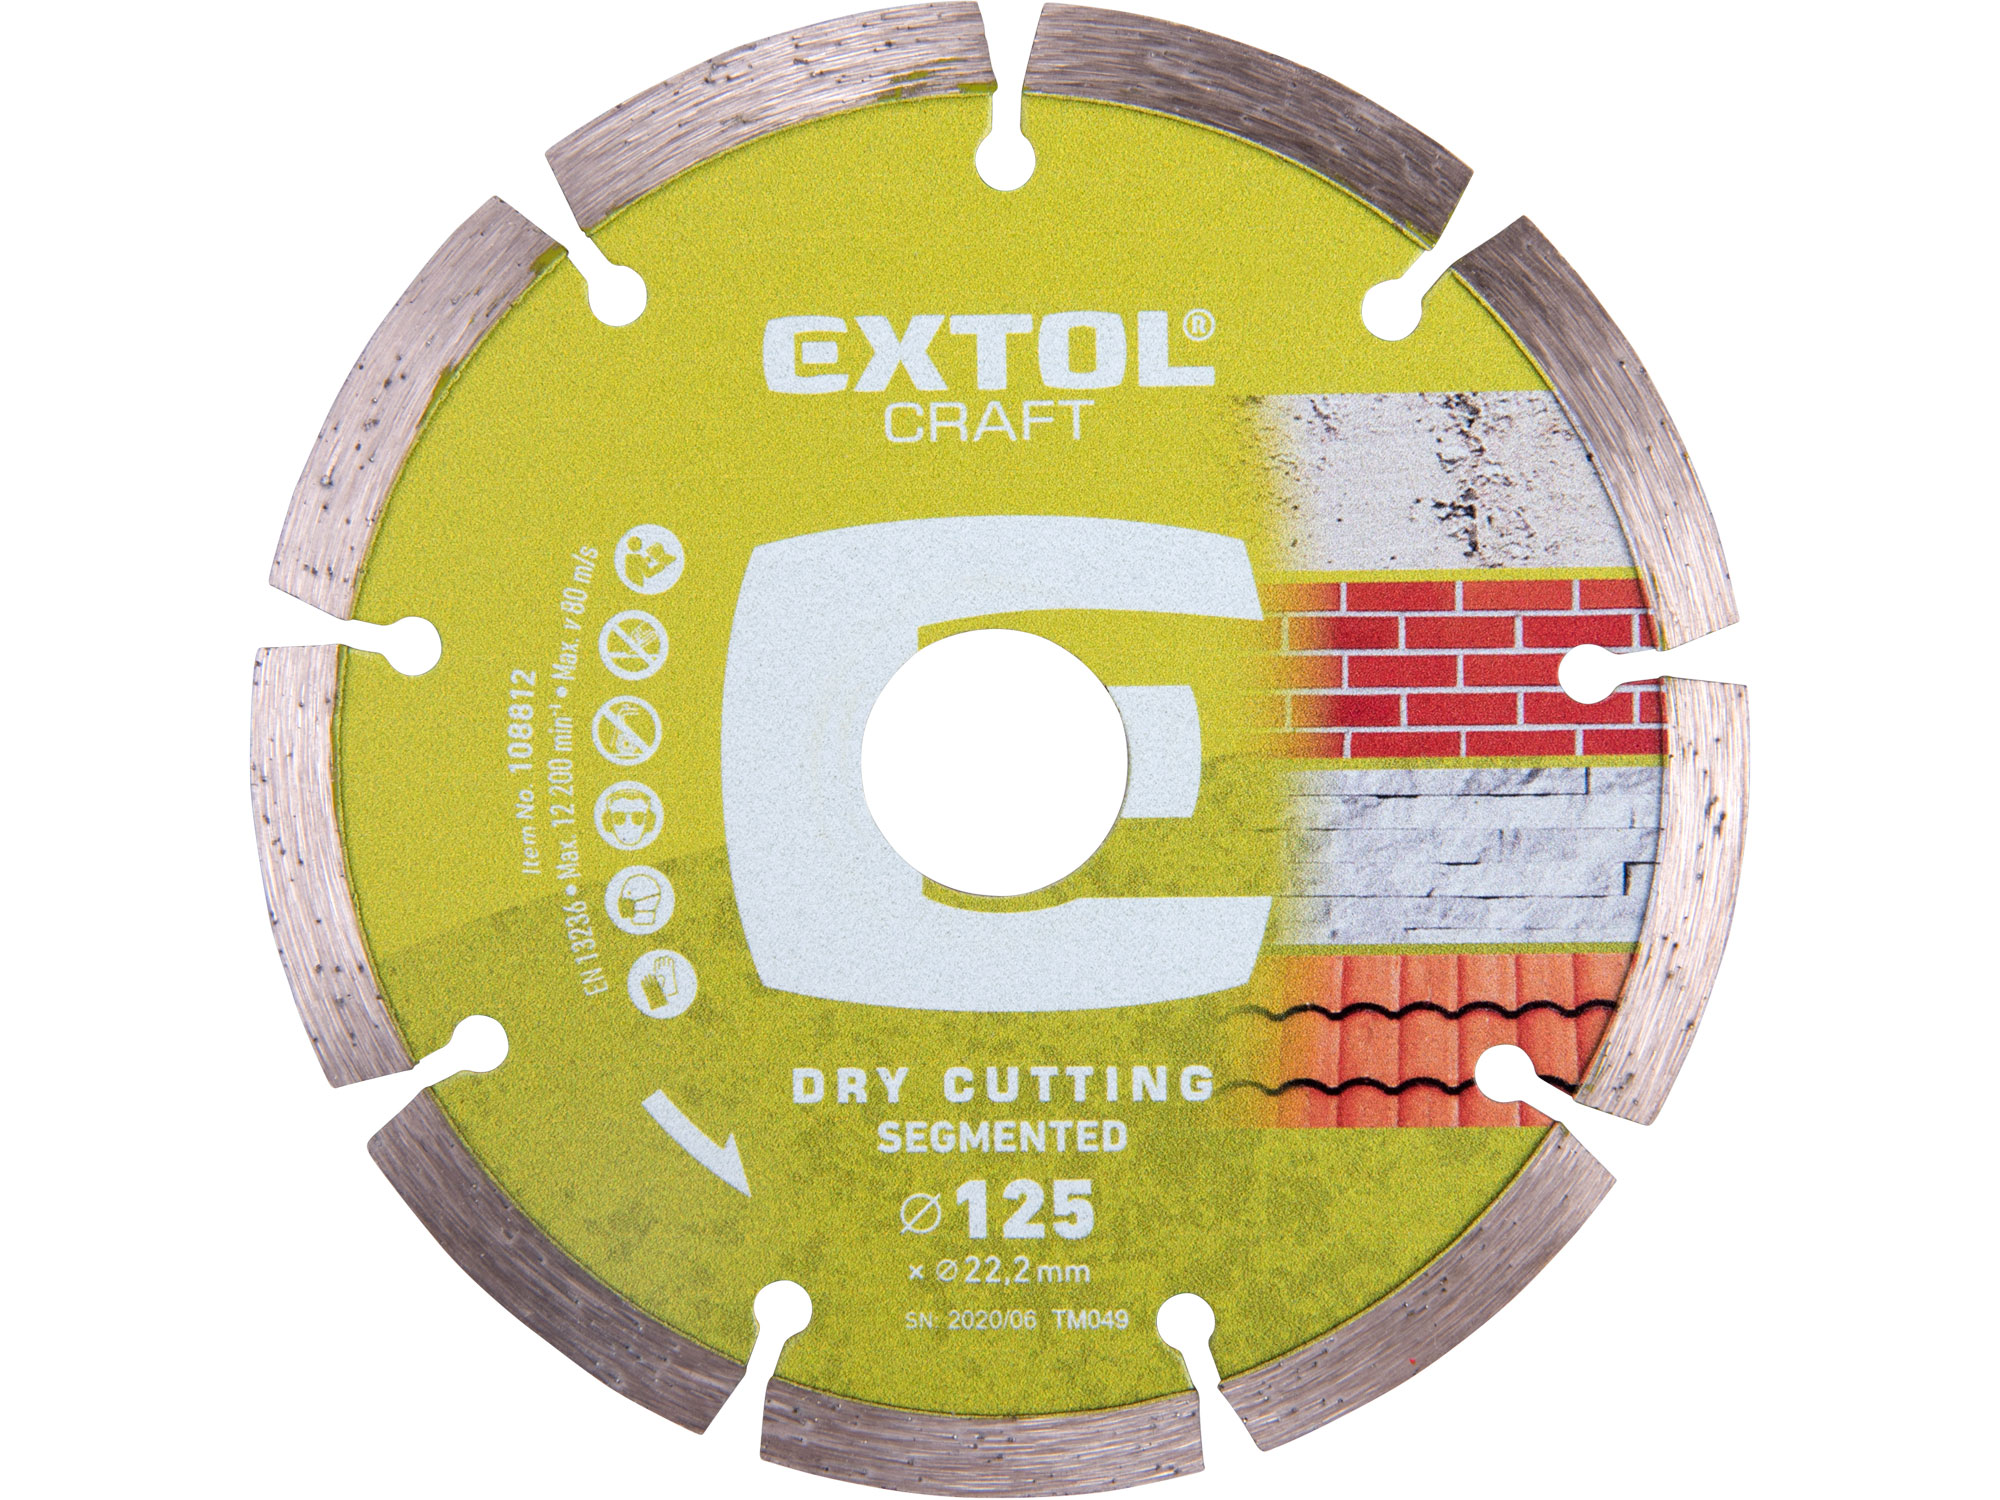 125mm Diamond Cutting Disc, Dry Type, 125mm Dia. 22.2mm ID, 2mm thk